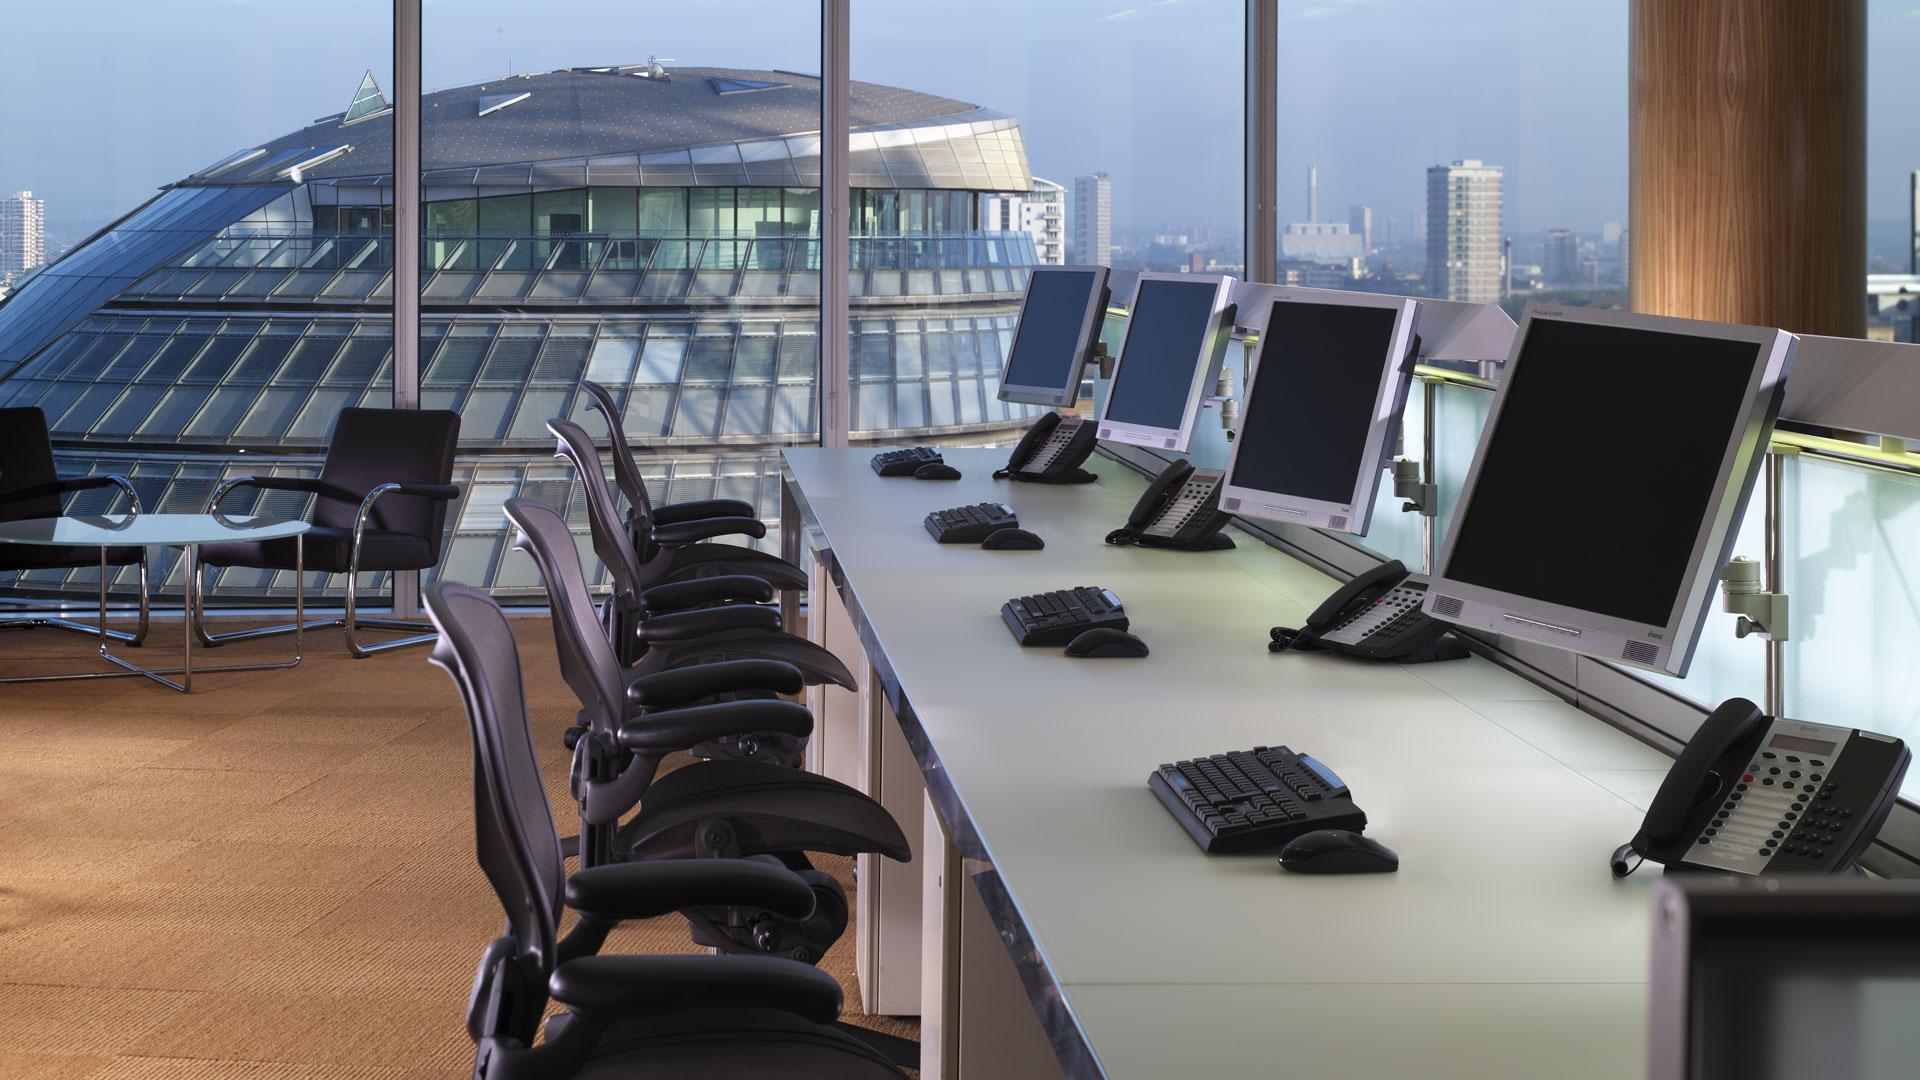 30337_workplace-image.jpg